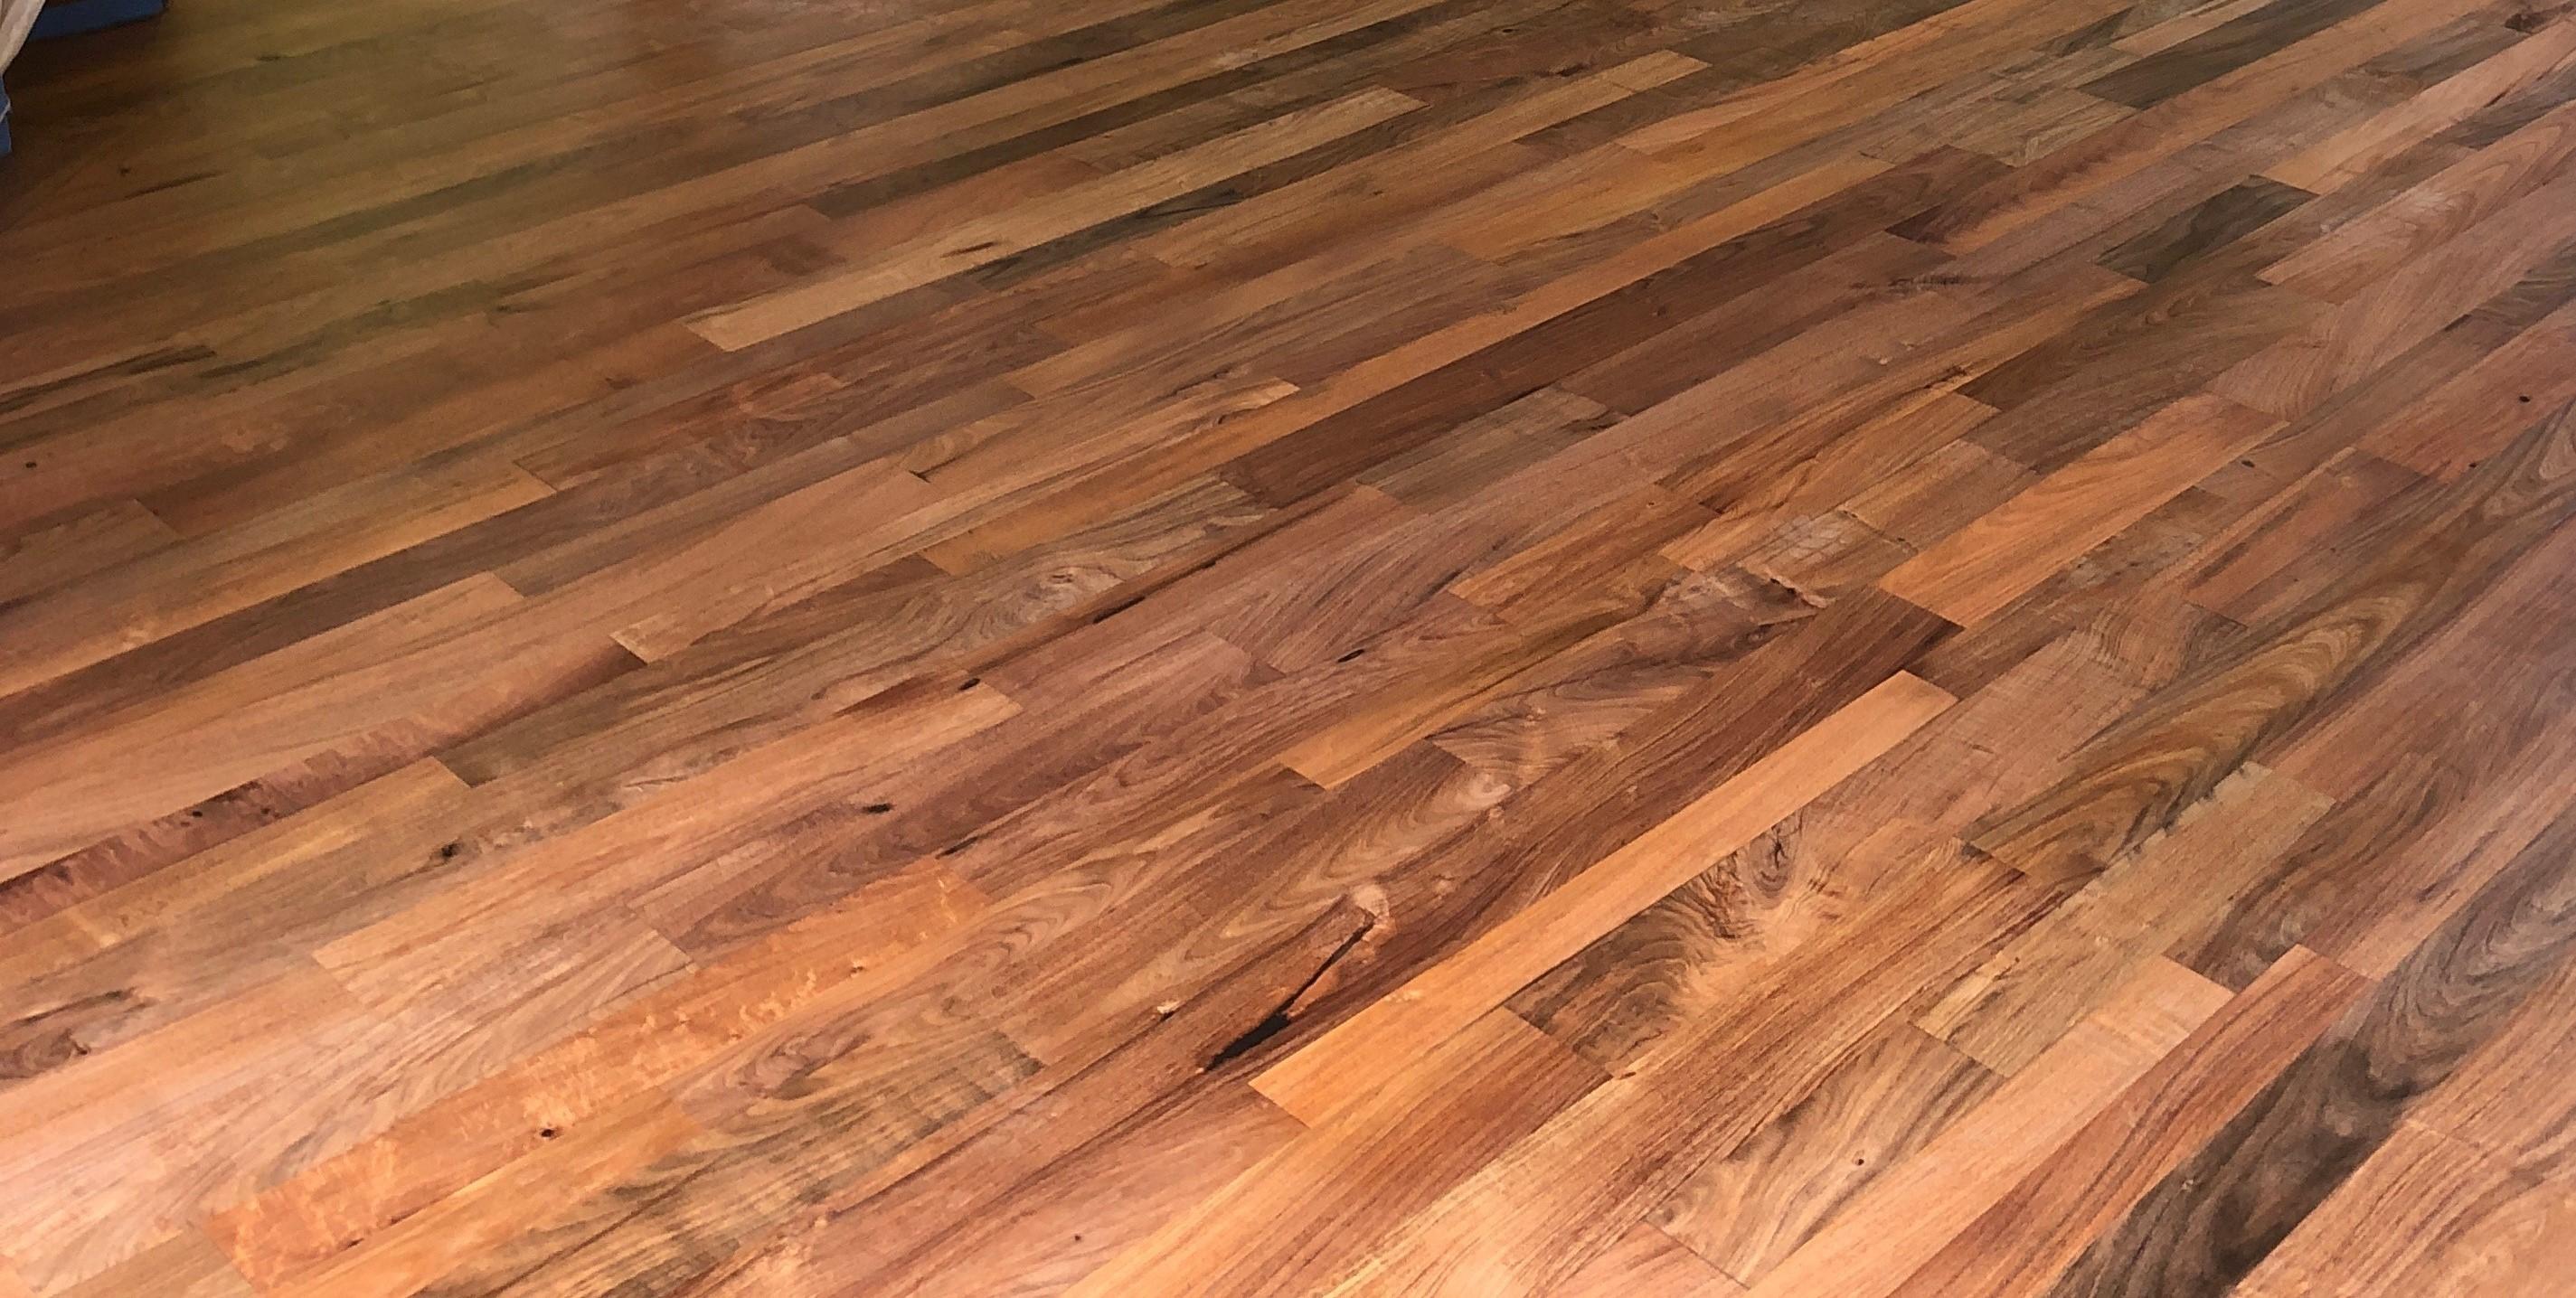 ELEMENTAL Hardwoods Adds Beautiful, But Rare Black Mesquite Hardwood to Exotic Flooring Line